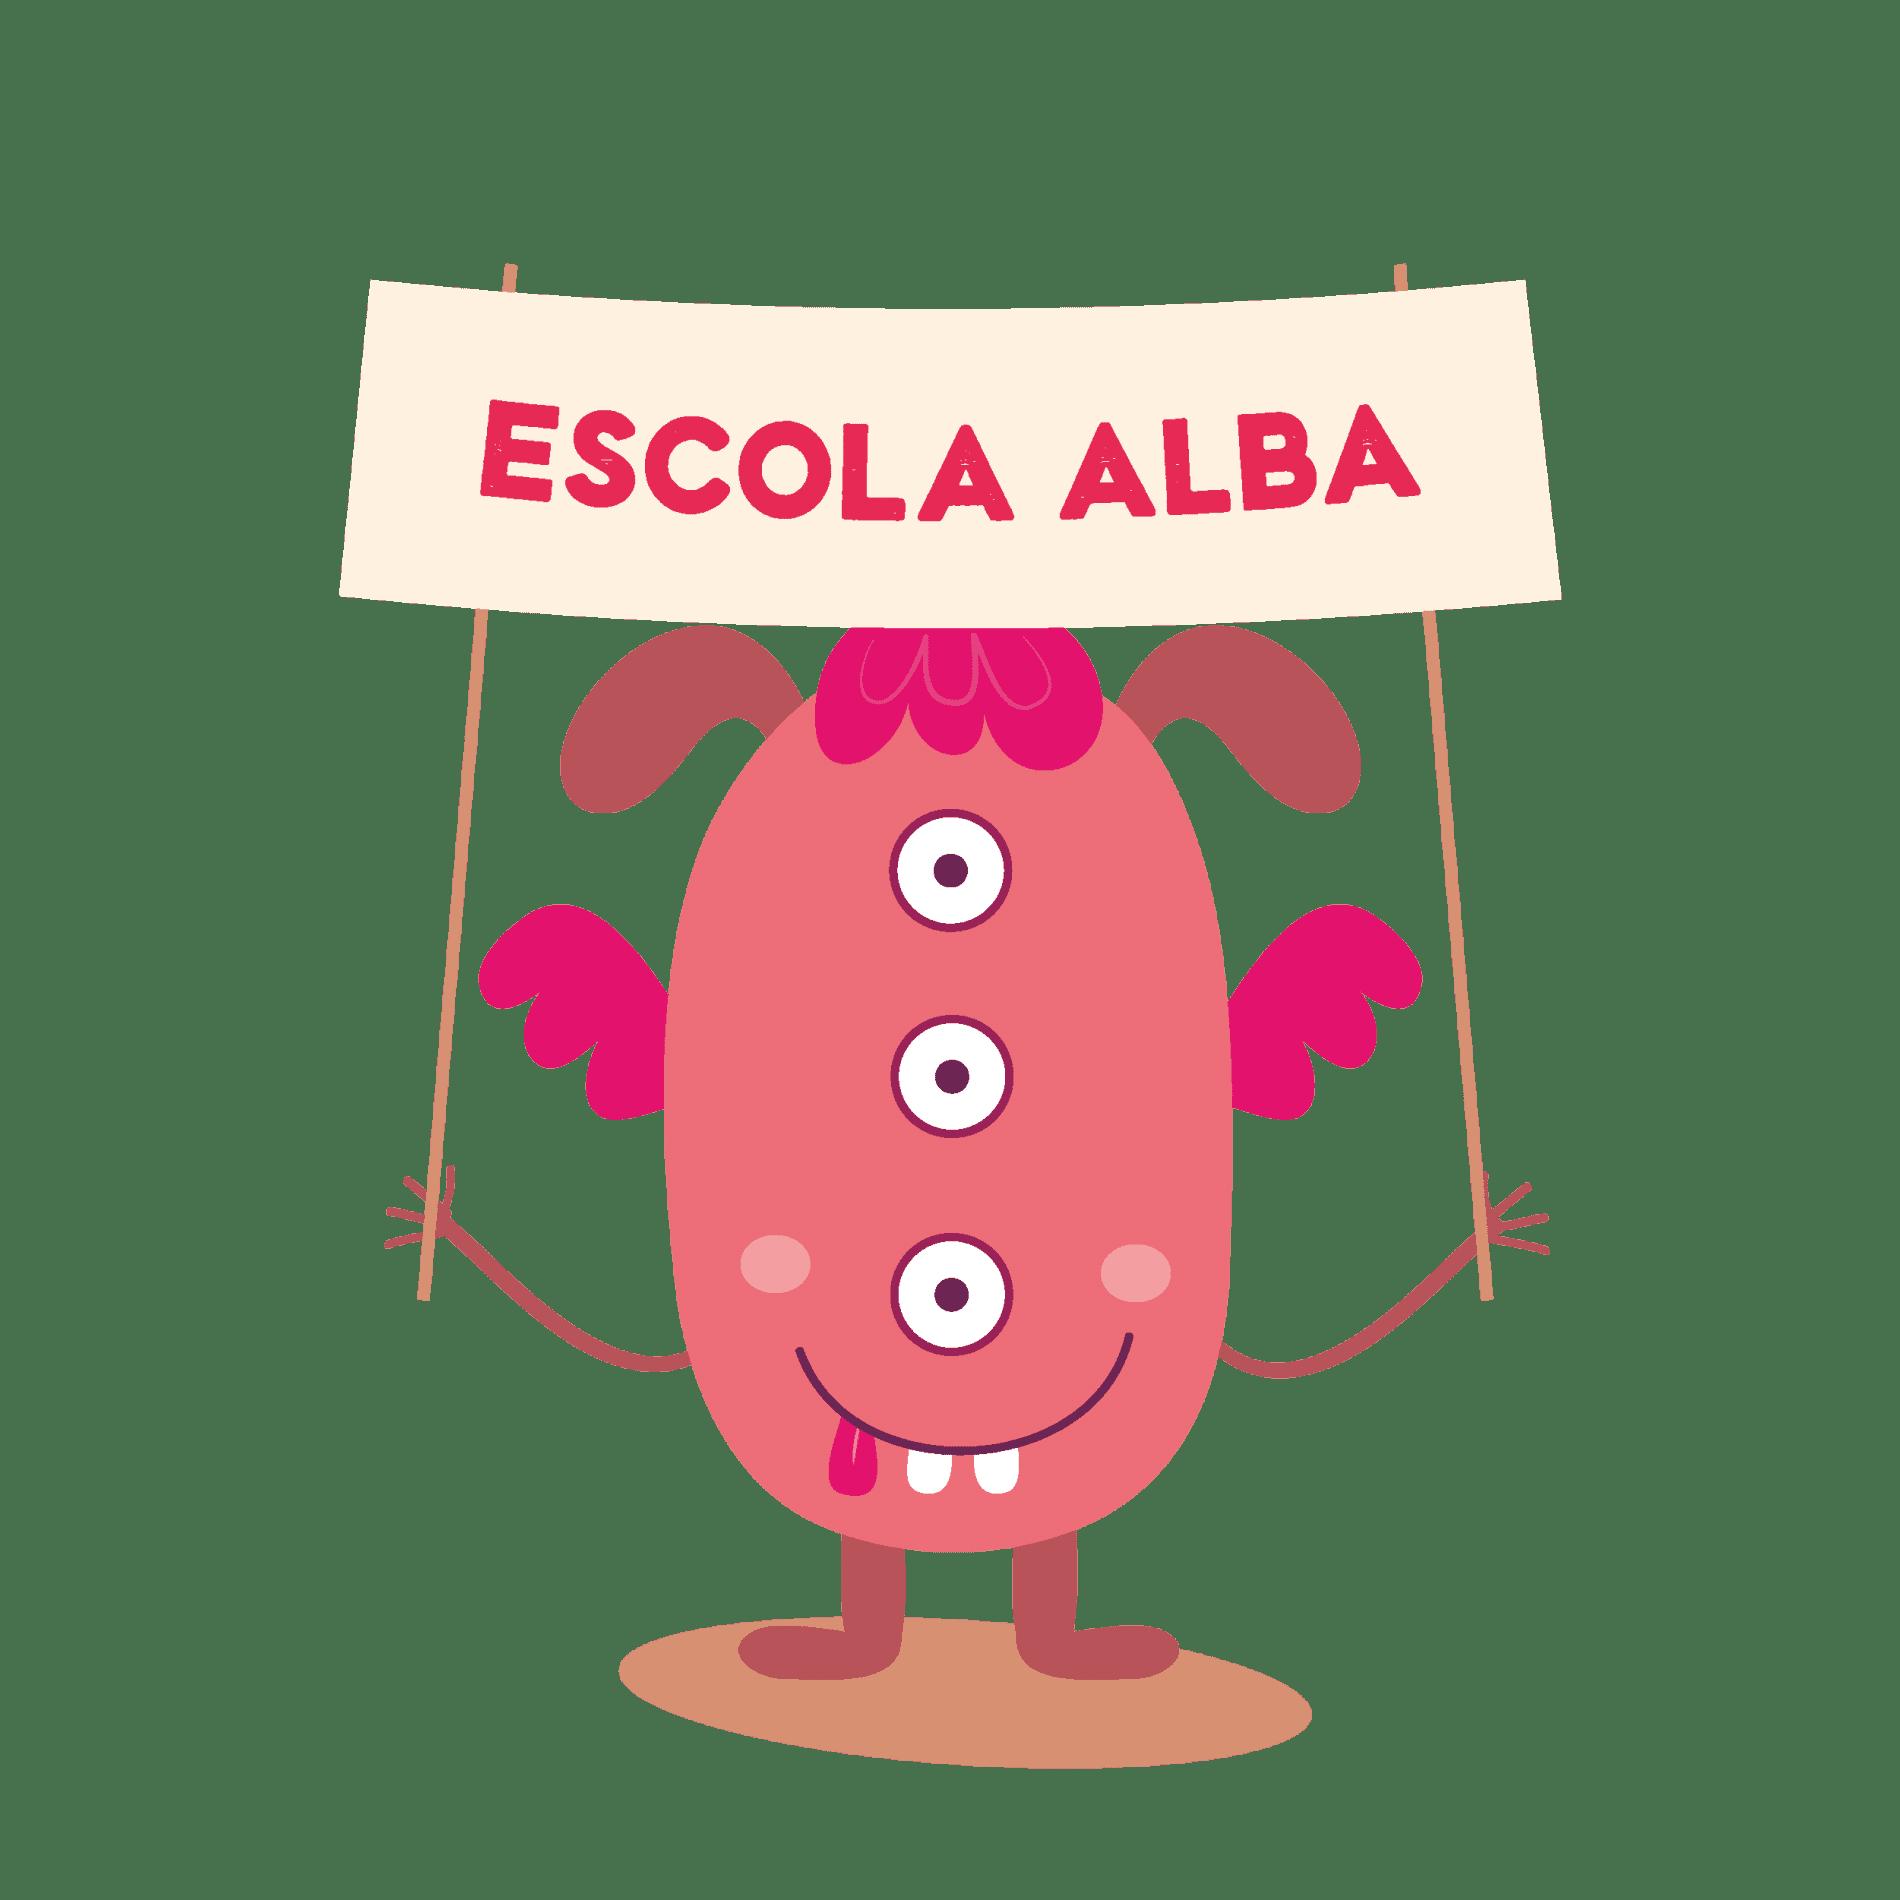 Casal_Estiu_EscolaAlba